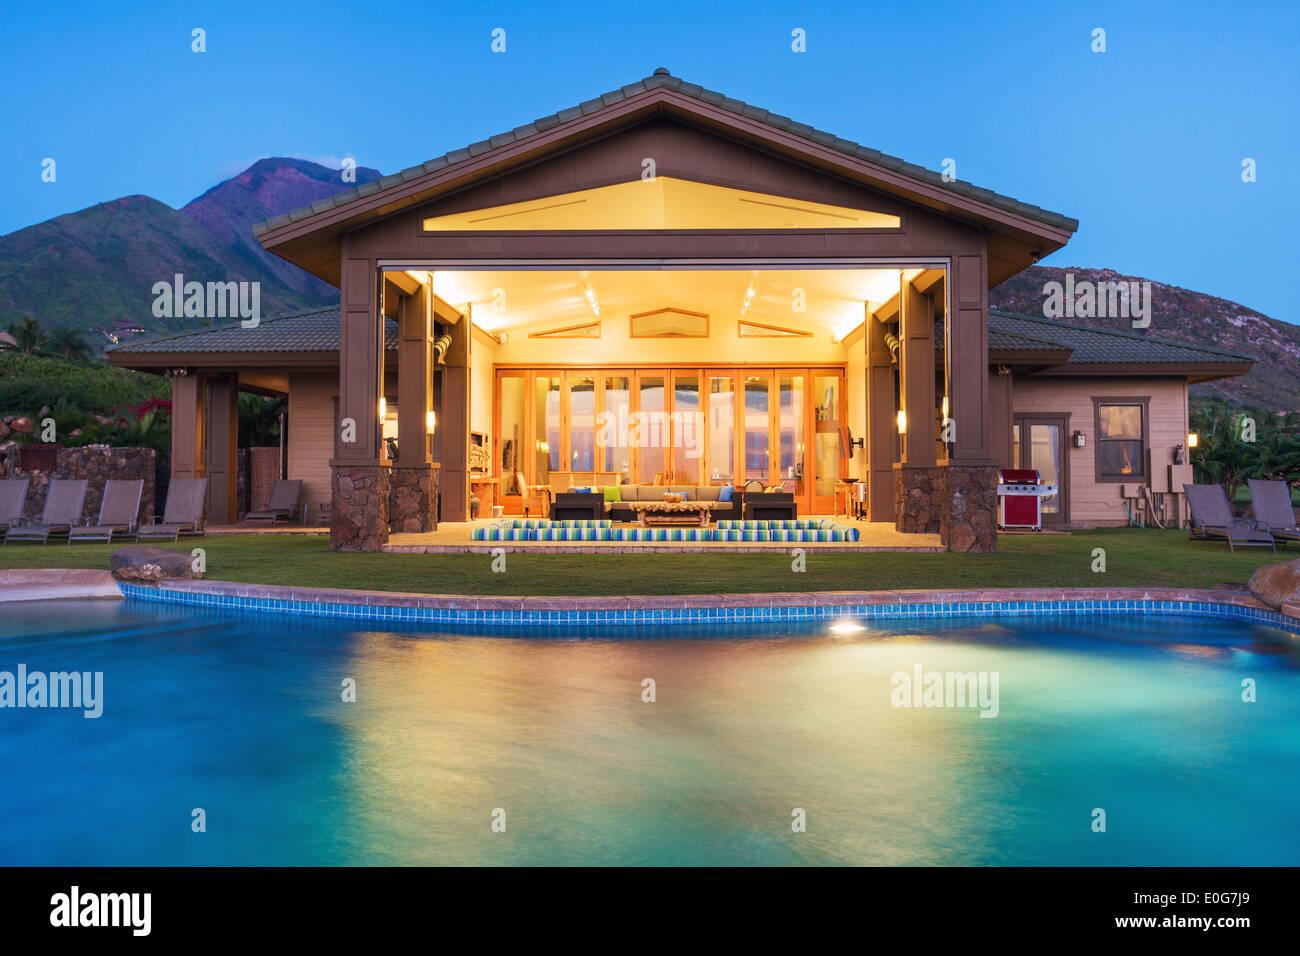 Casa de lujo con piscina al atardecer Imagen De Stock